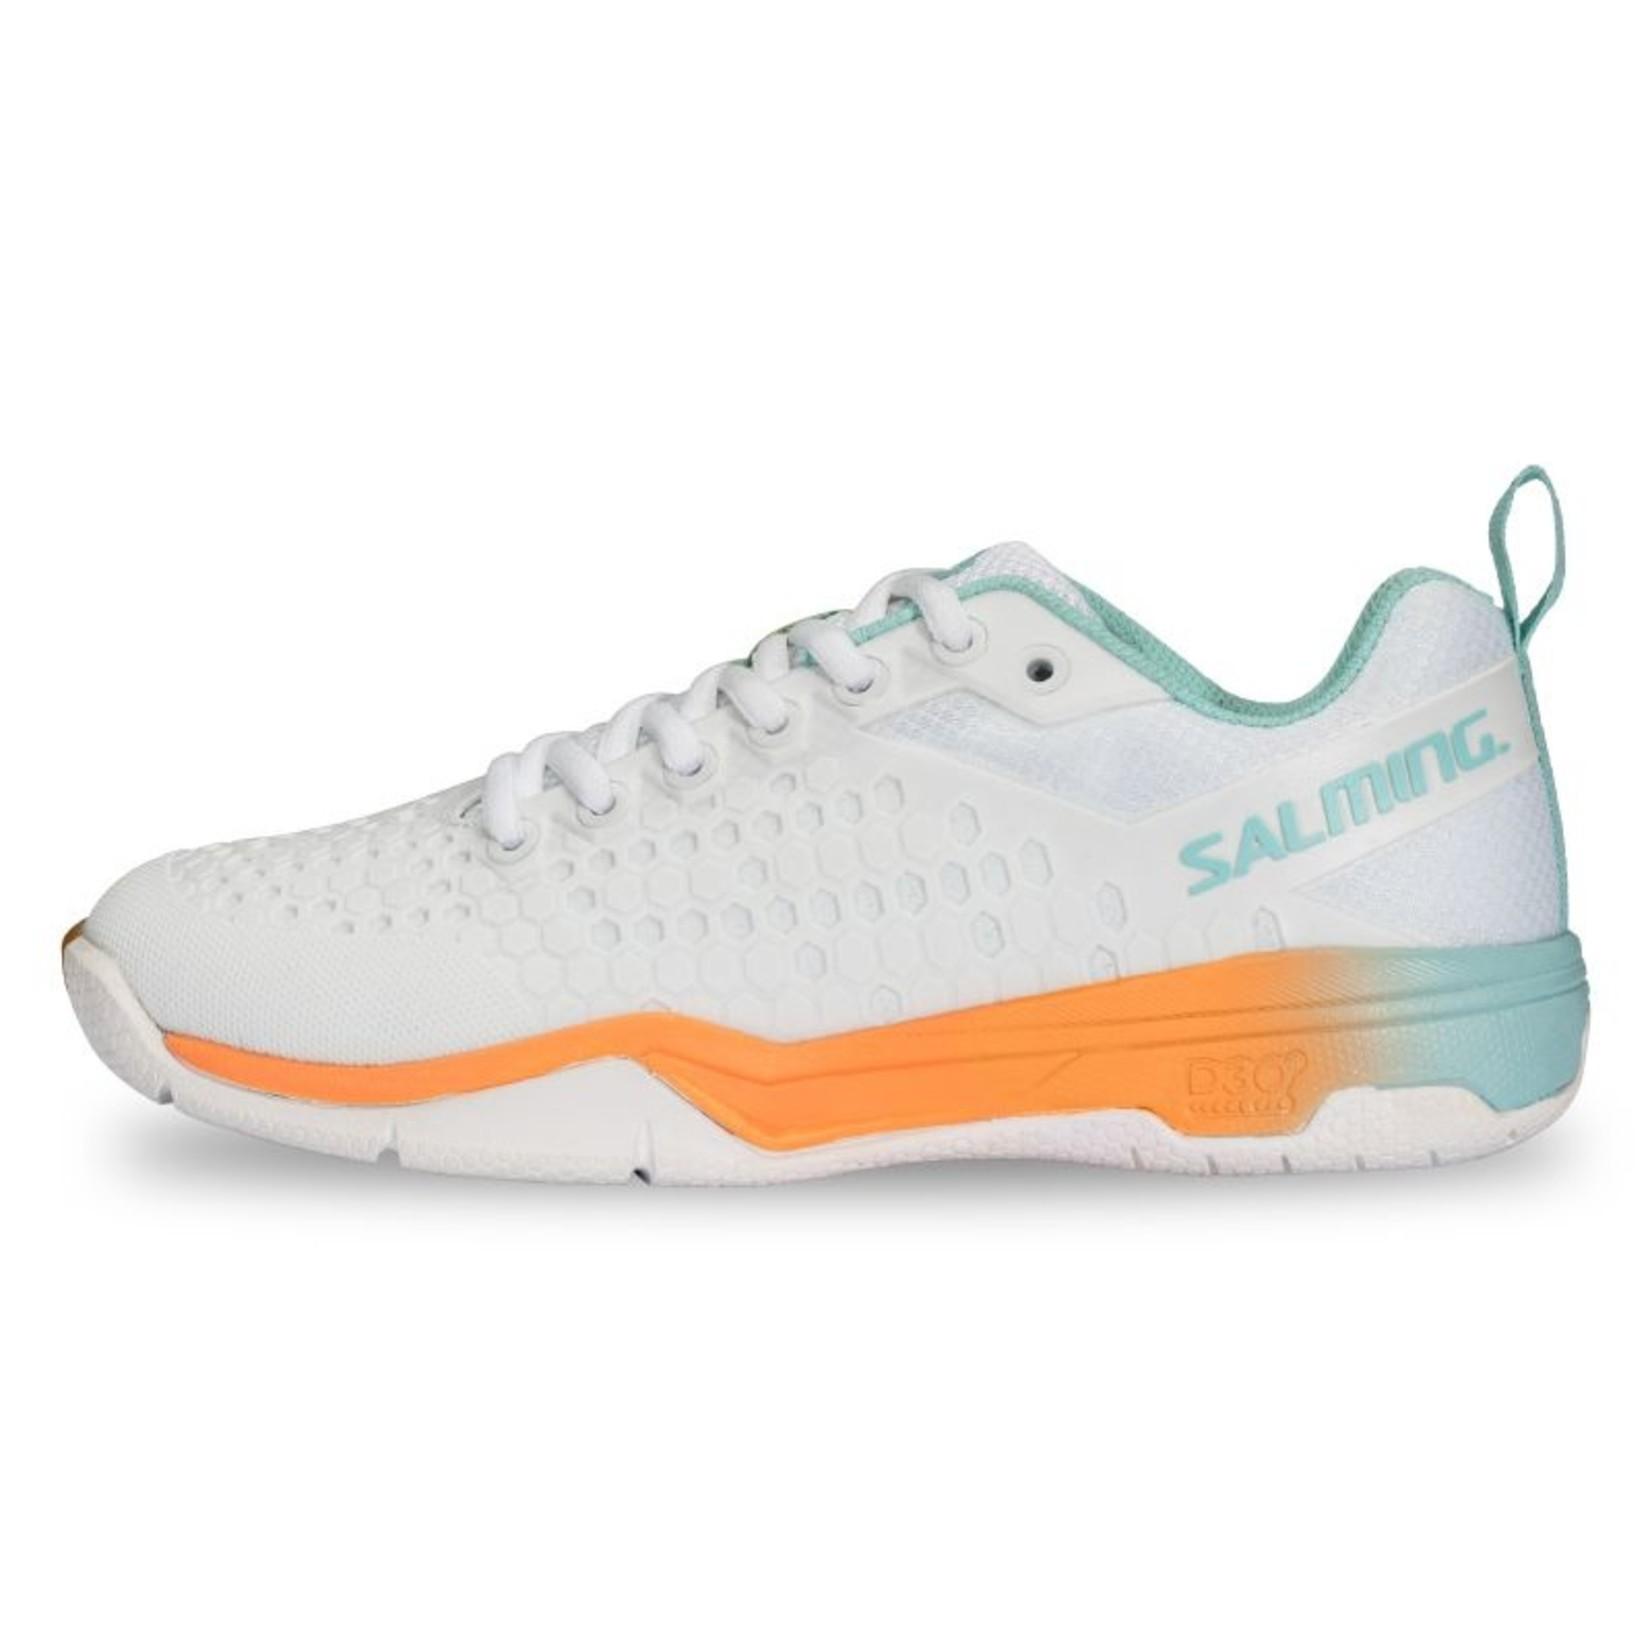 Salming Eagle Shoe Women